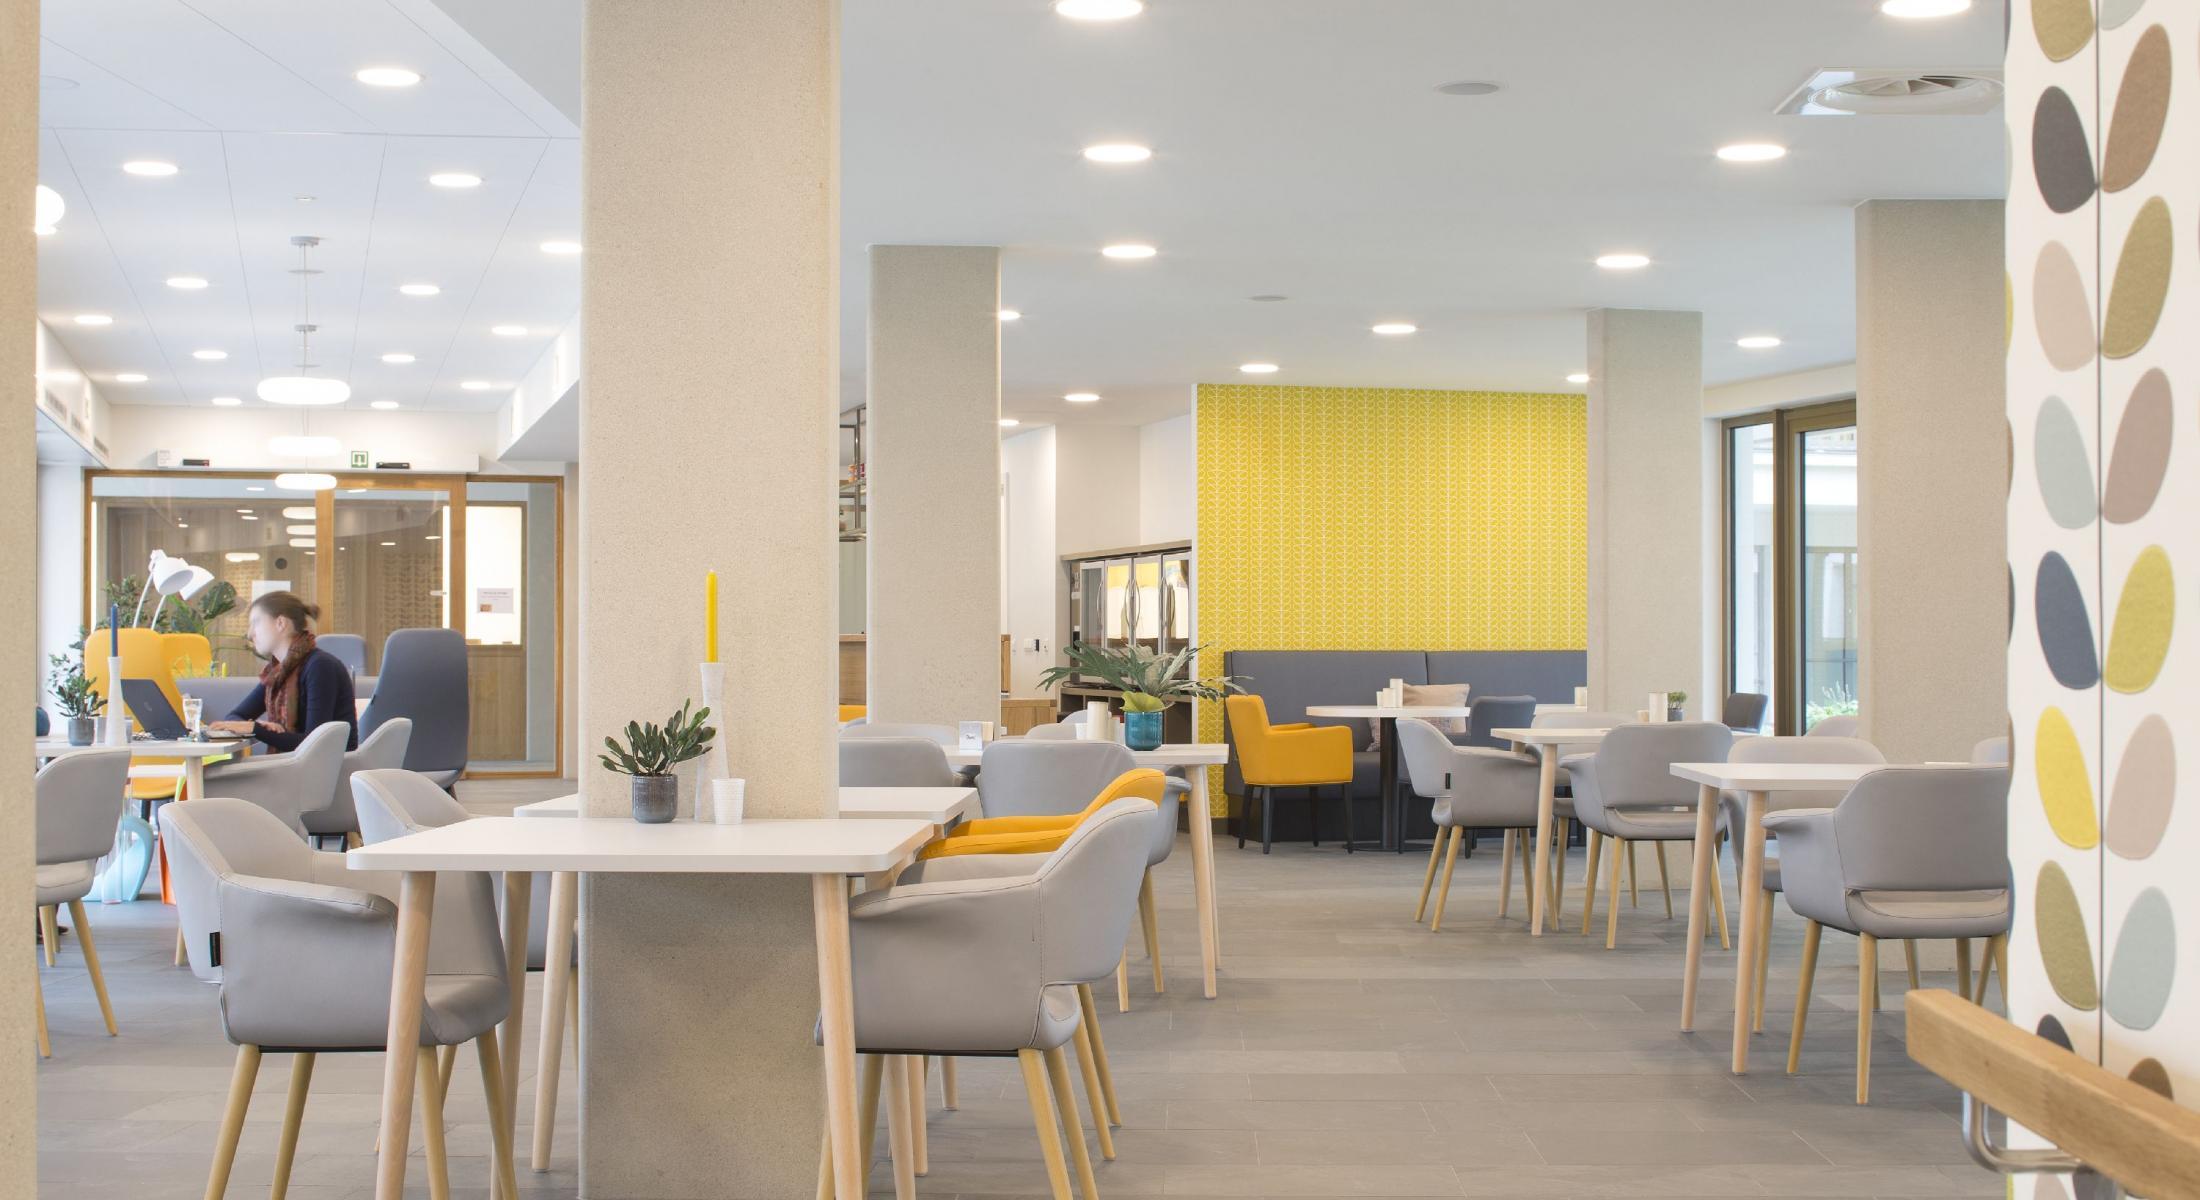 Creating Hospitality - WZC Parkhof Machelen 5 - moments furniture